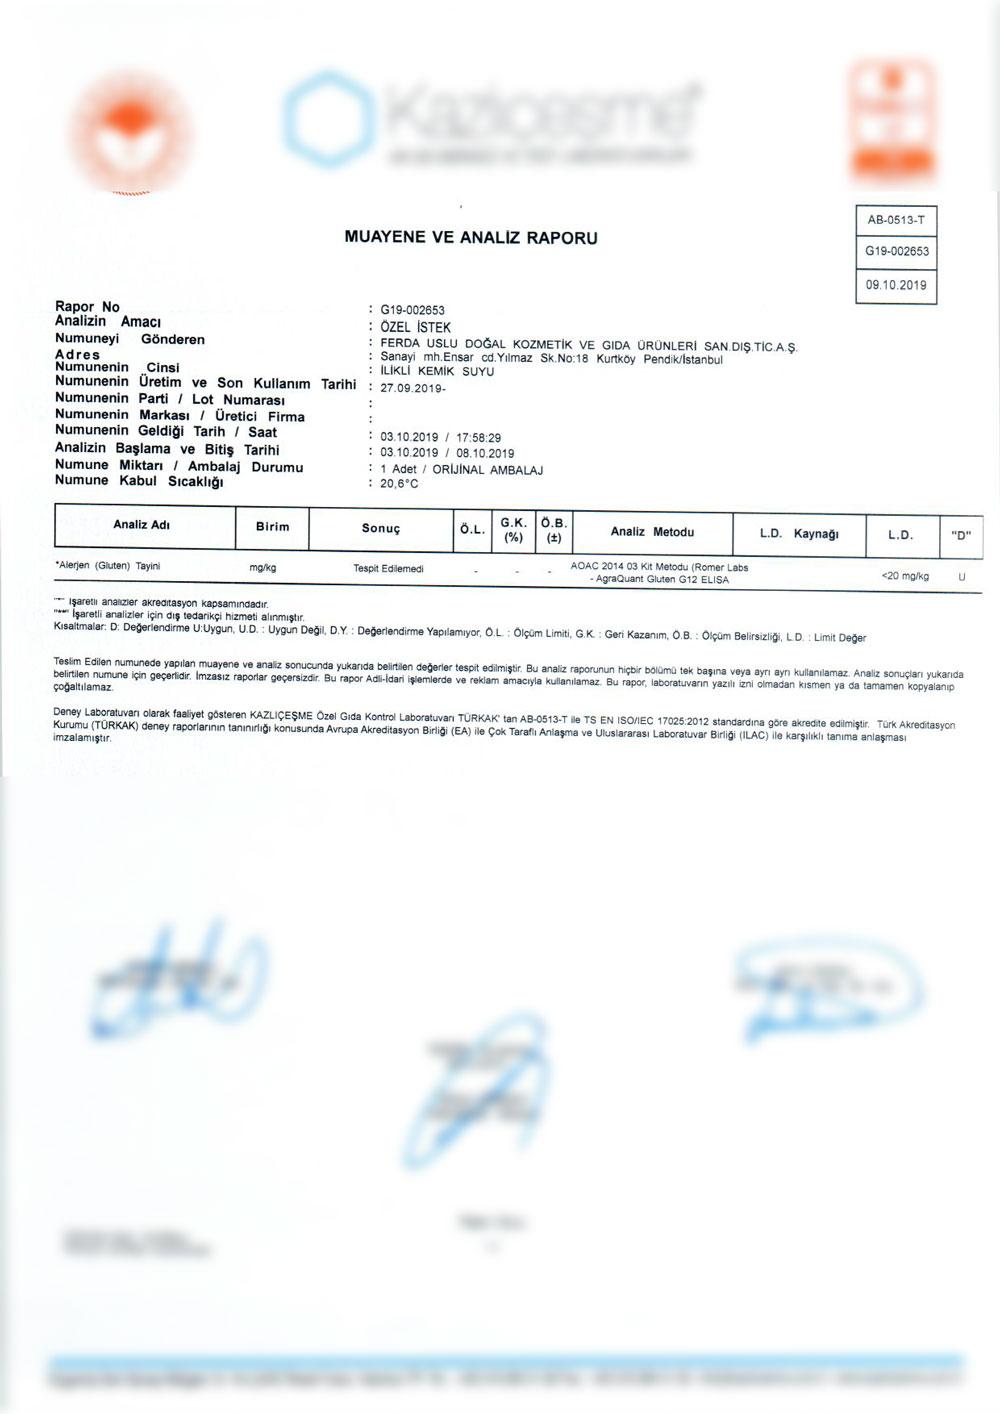 ilikli-kemik-suyu-gluten-içermez-Analiz-Raporu.jpg (137 KB)